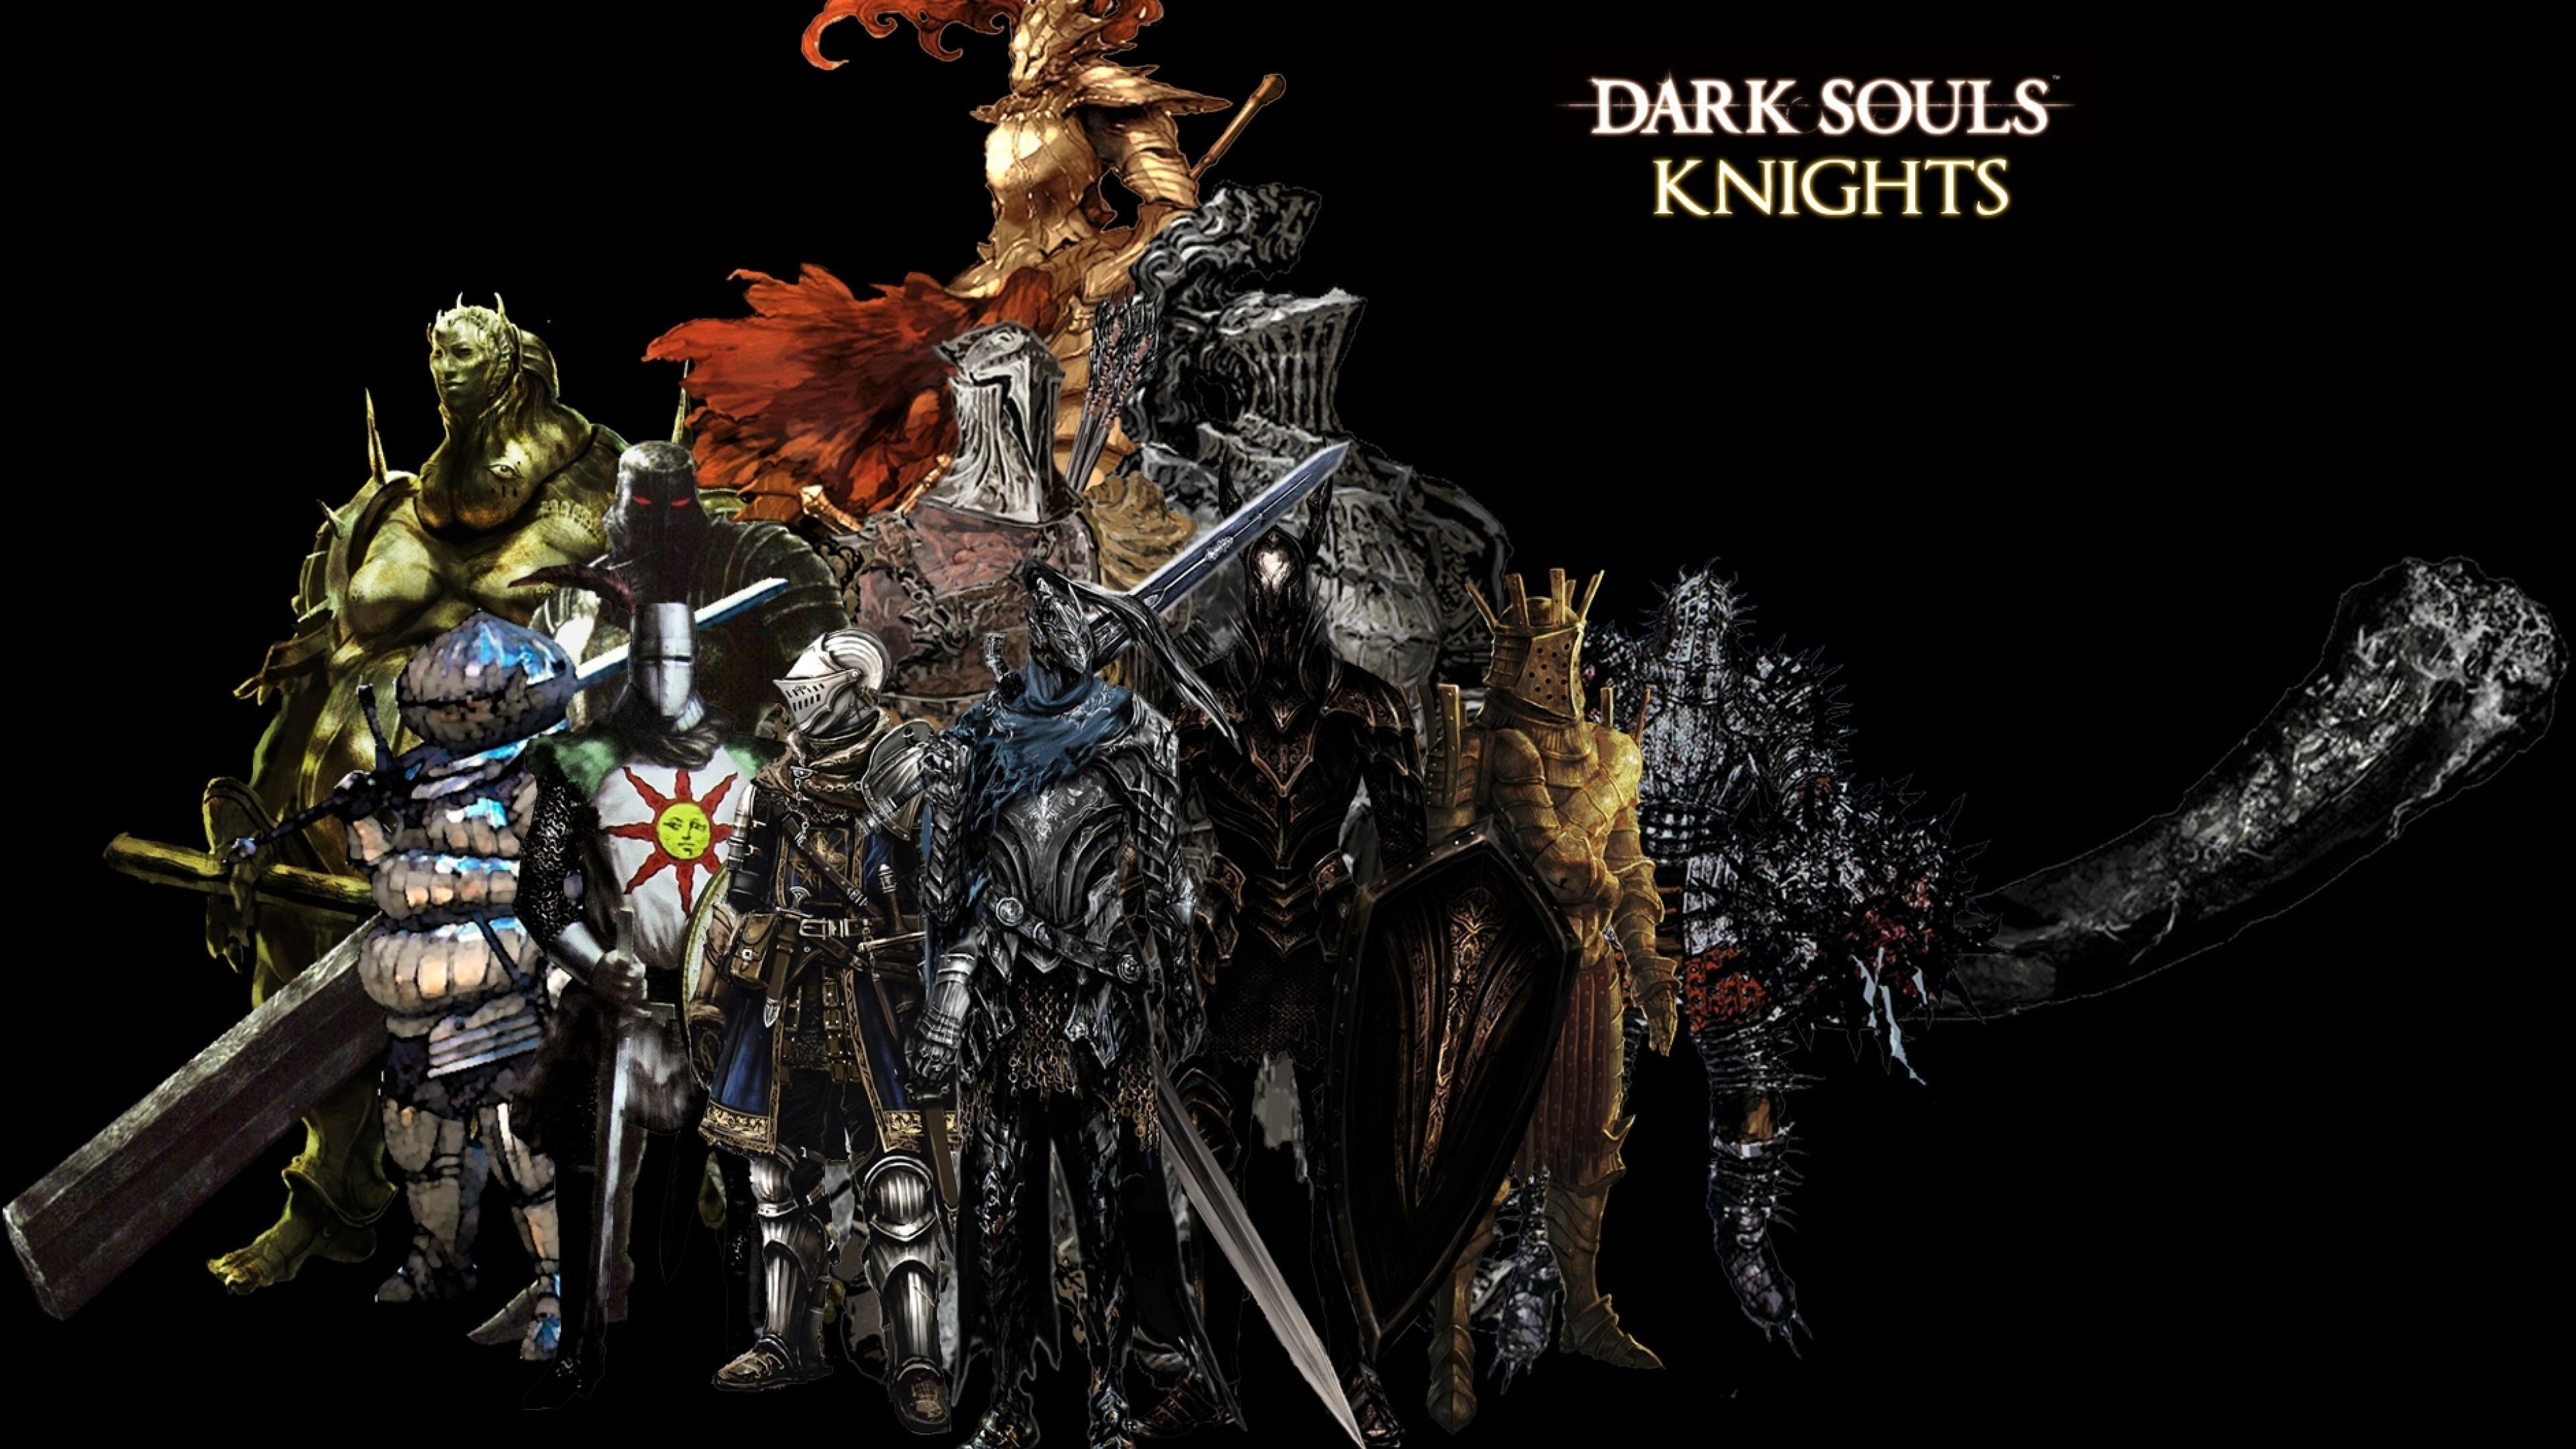 Dark Souls Hd Wallpaper 1920×1080 Id55699 Dark Souls Wallpaper